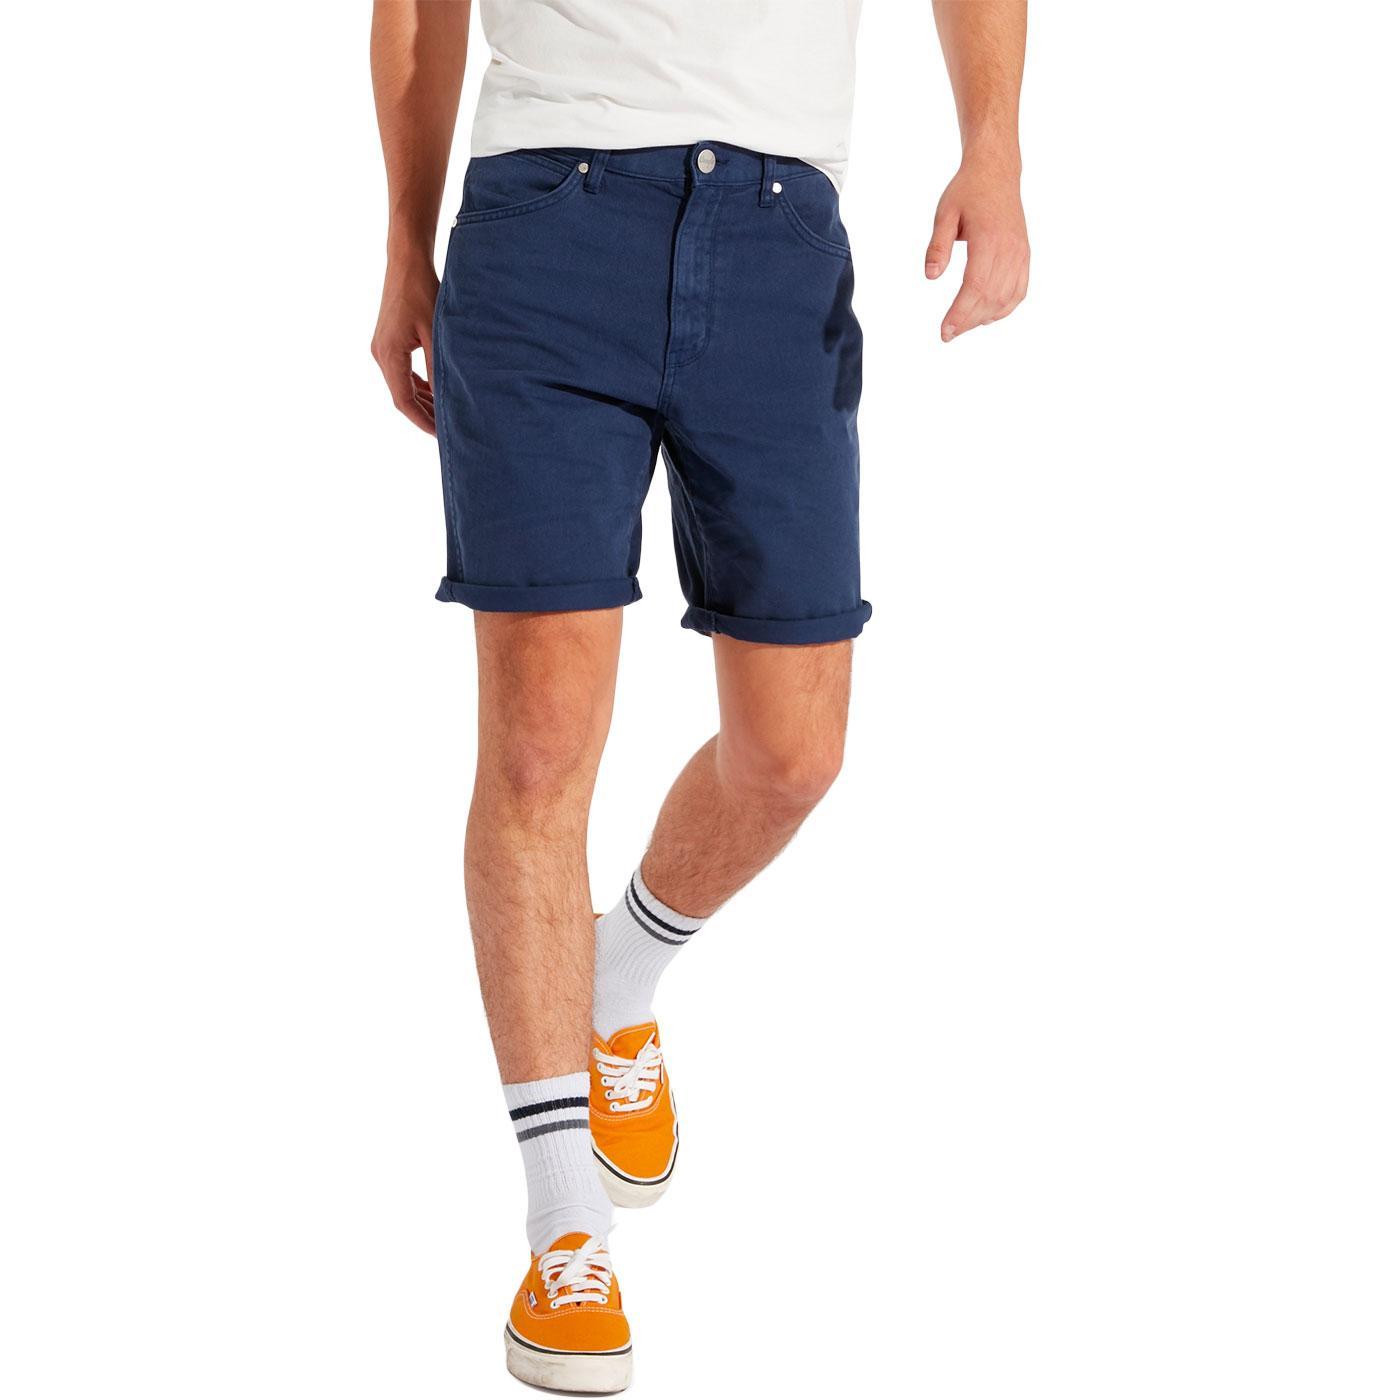 WRANGLER Men's Retro 6 Pocket Chino Shorts INDIGO